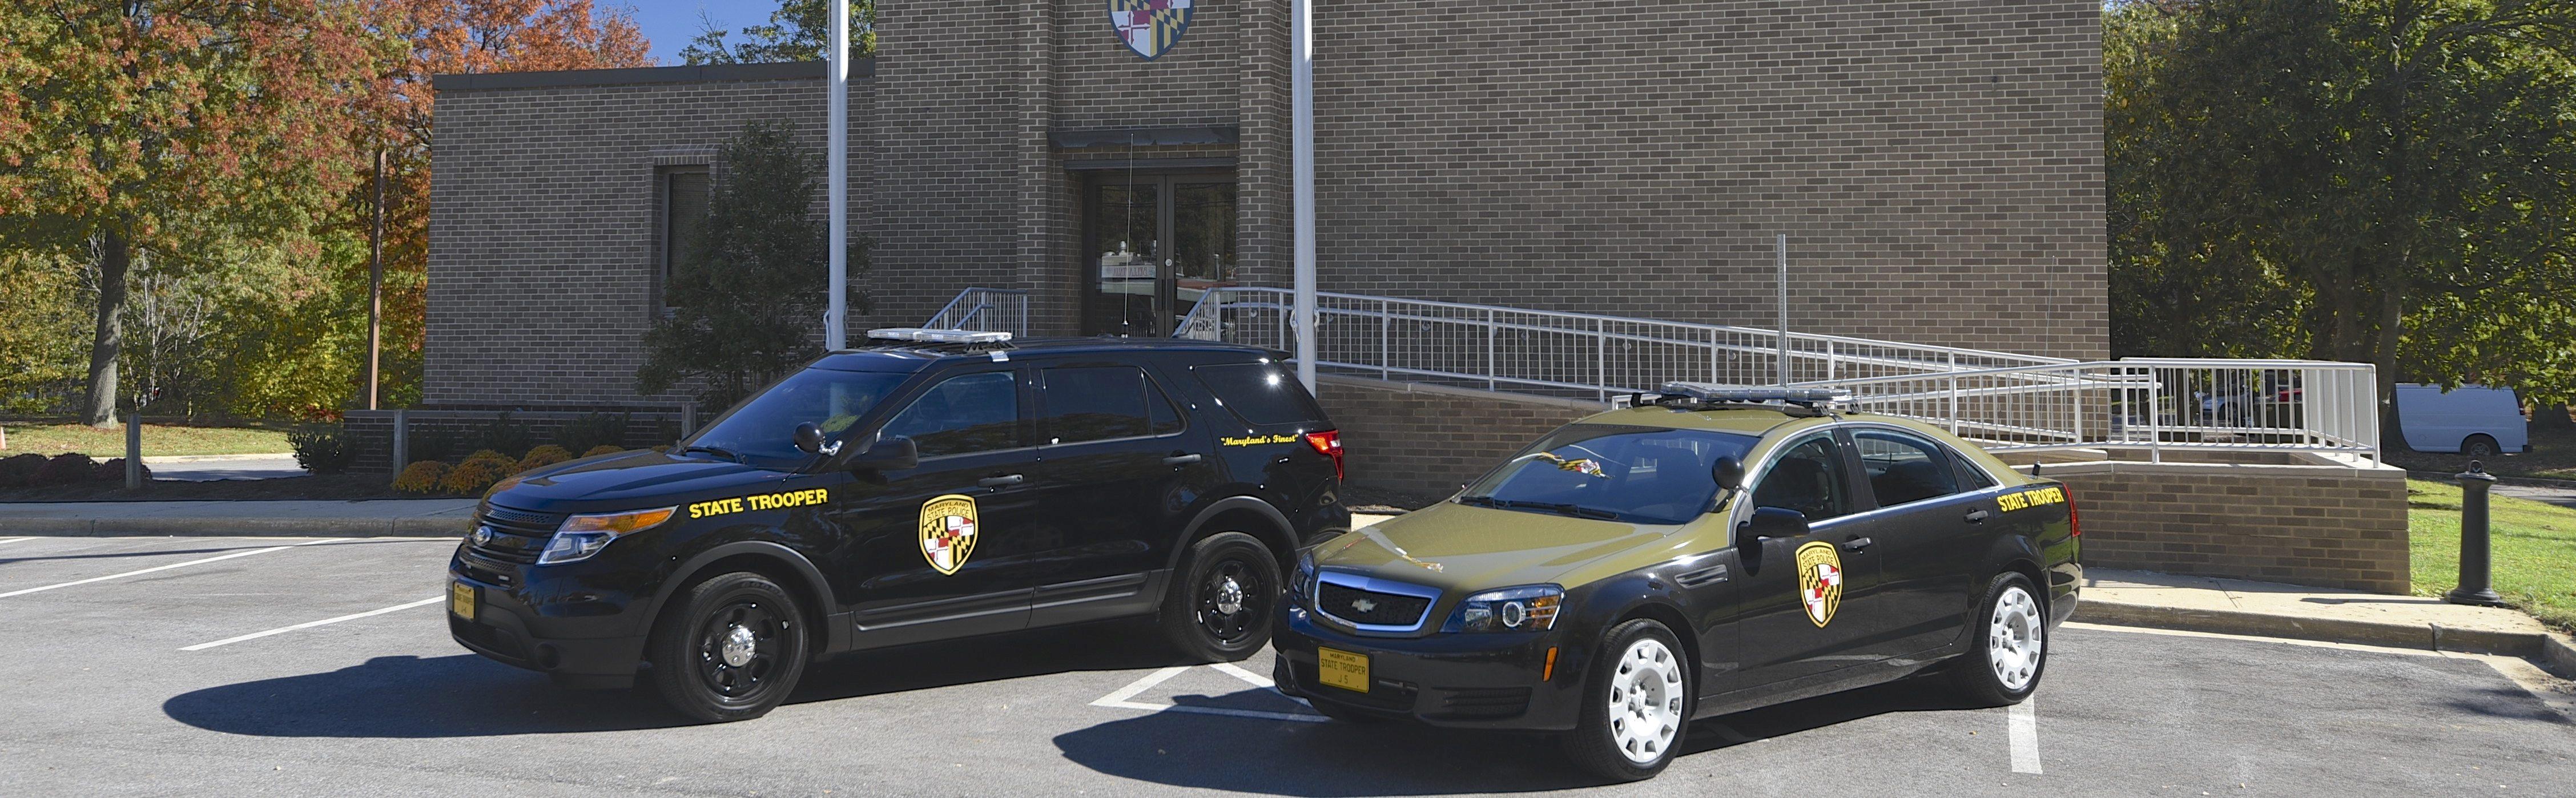 Alabama Warrant Search